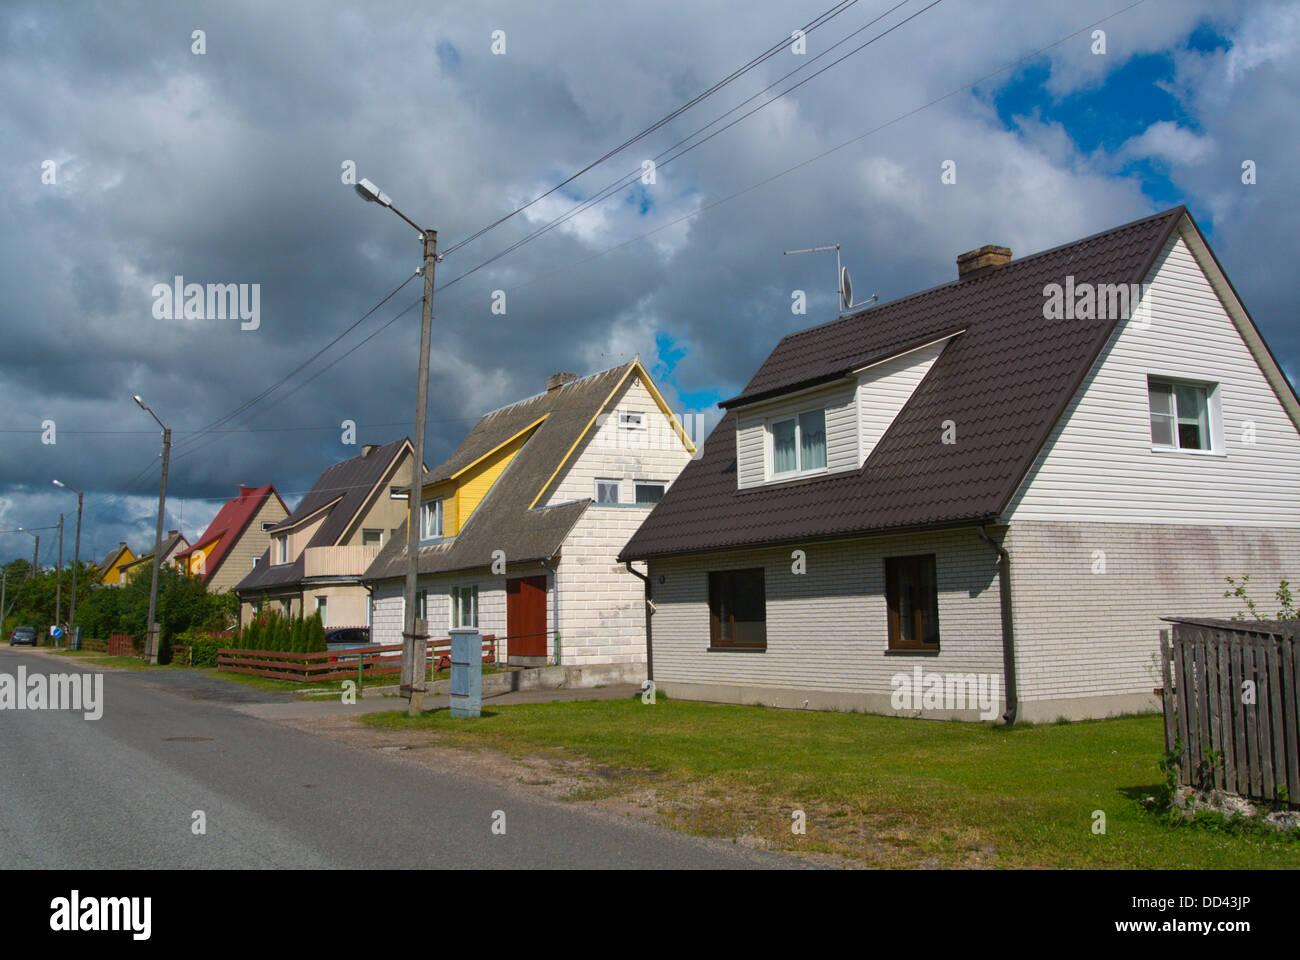 Detached homes suburb in Nooruse streett Kuressaare town Saaremaa island Estonia northern Europe Stock Photo